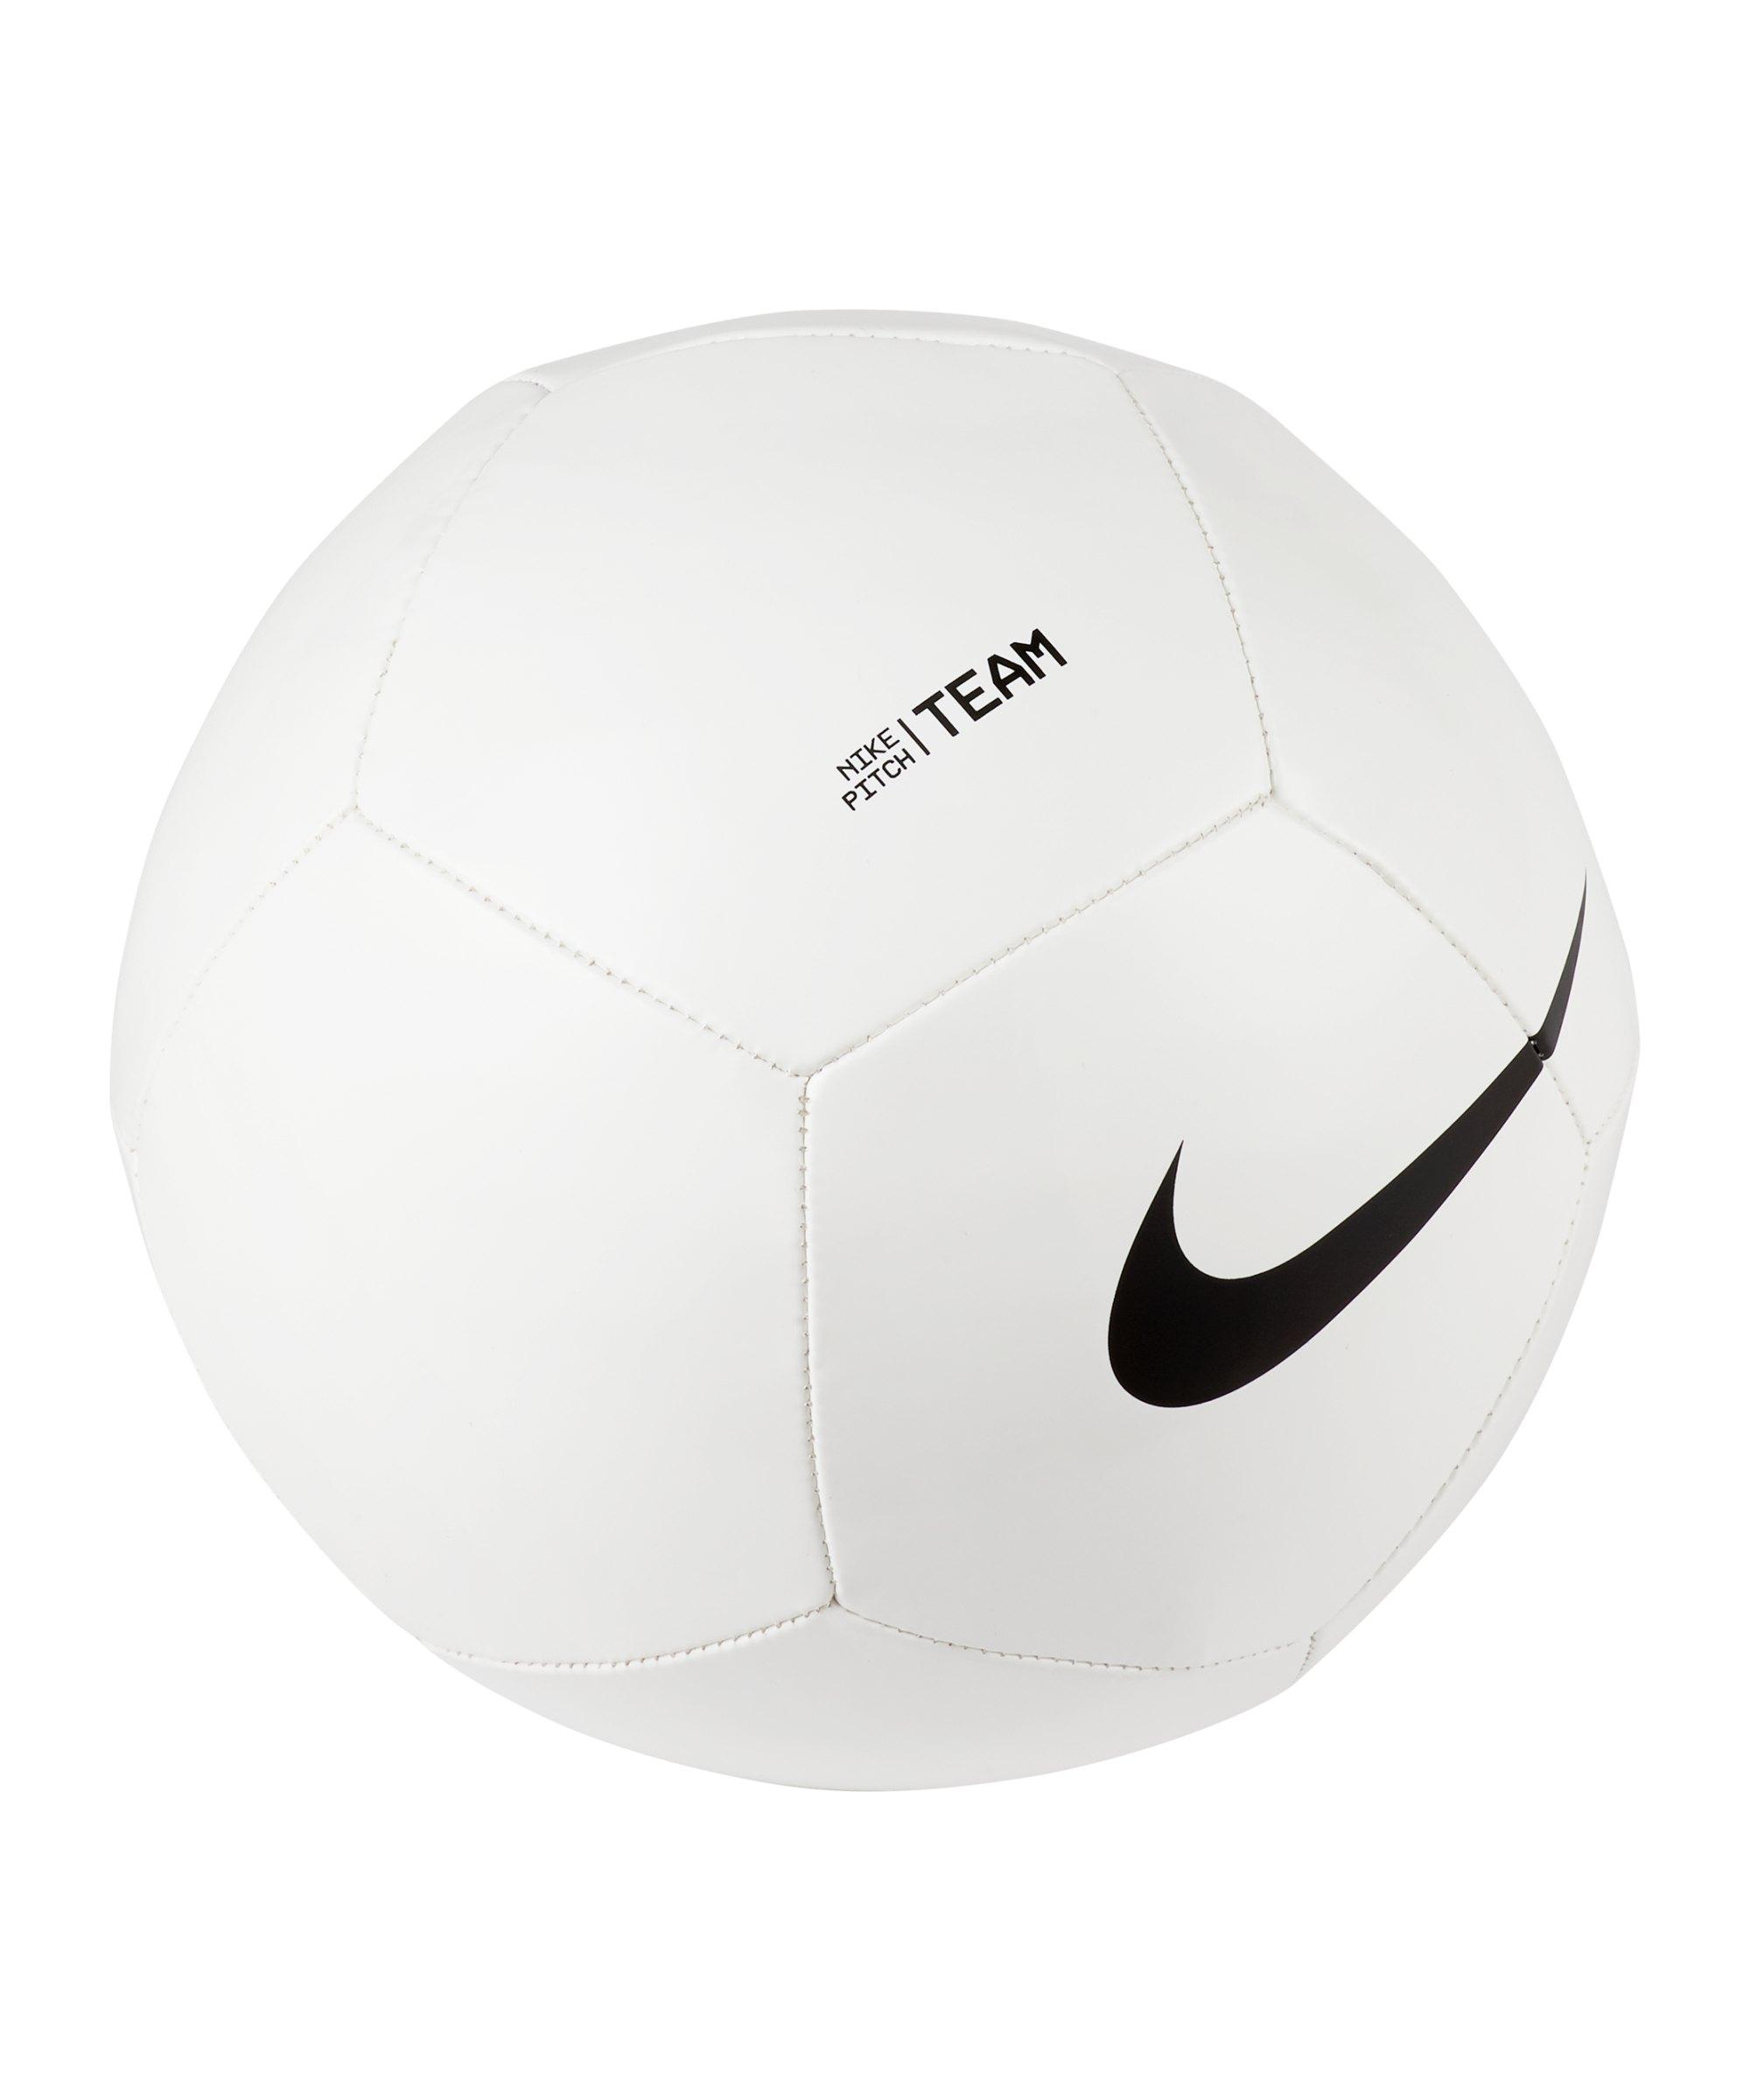 Nike Pitch Team Trainingsball Weiss Schwarz F100 - weiss